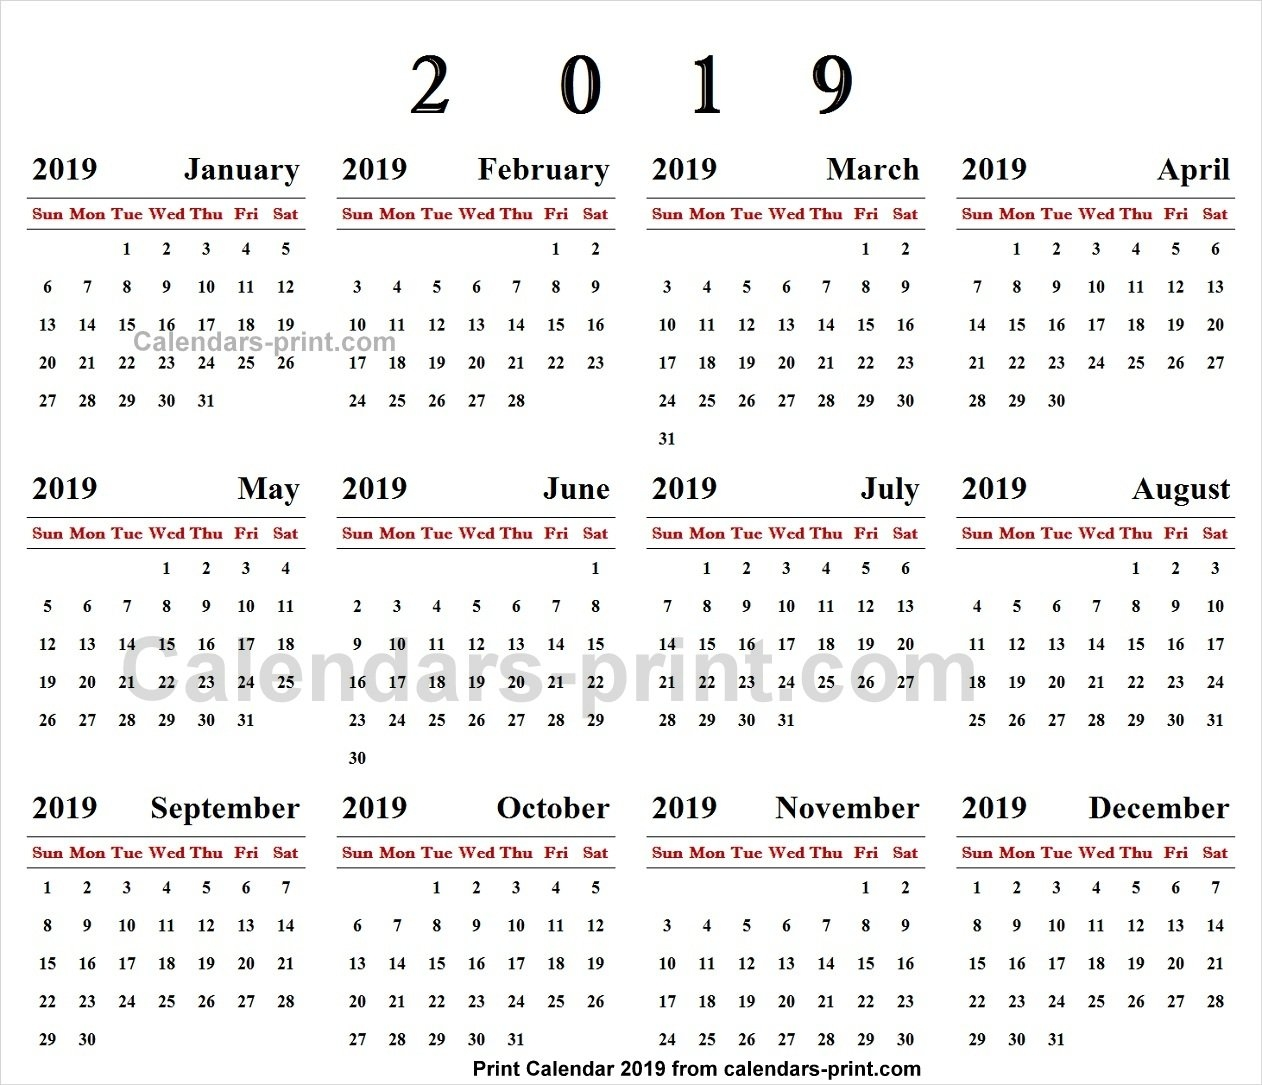 Online Calendar 2019 Printable Template With Notes | Holidays Calendar 2019 Order Online